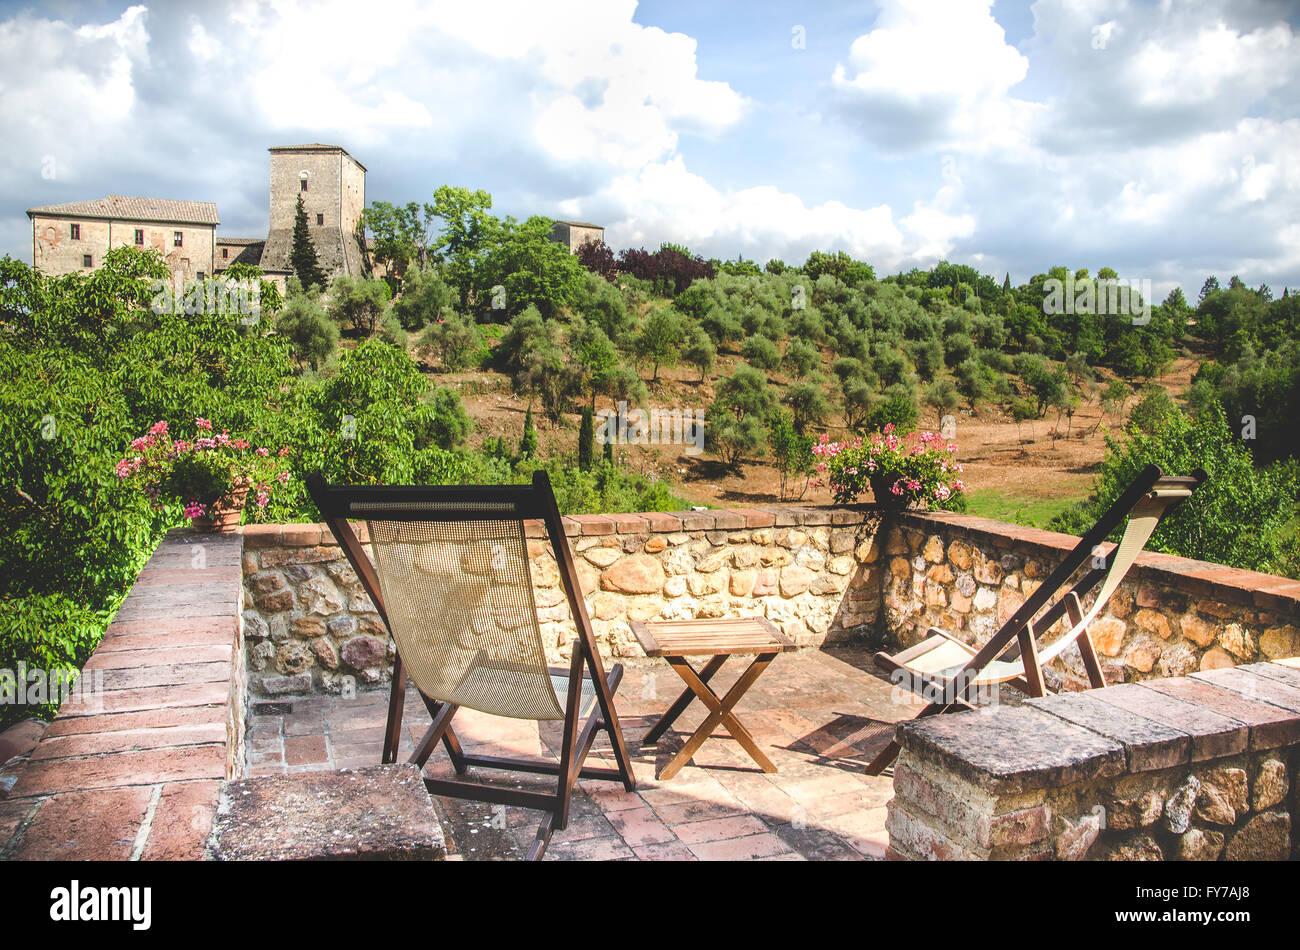 transat balcon toscane paysage dtente - Transat Balcon